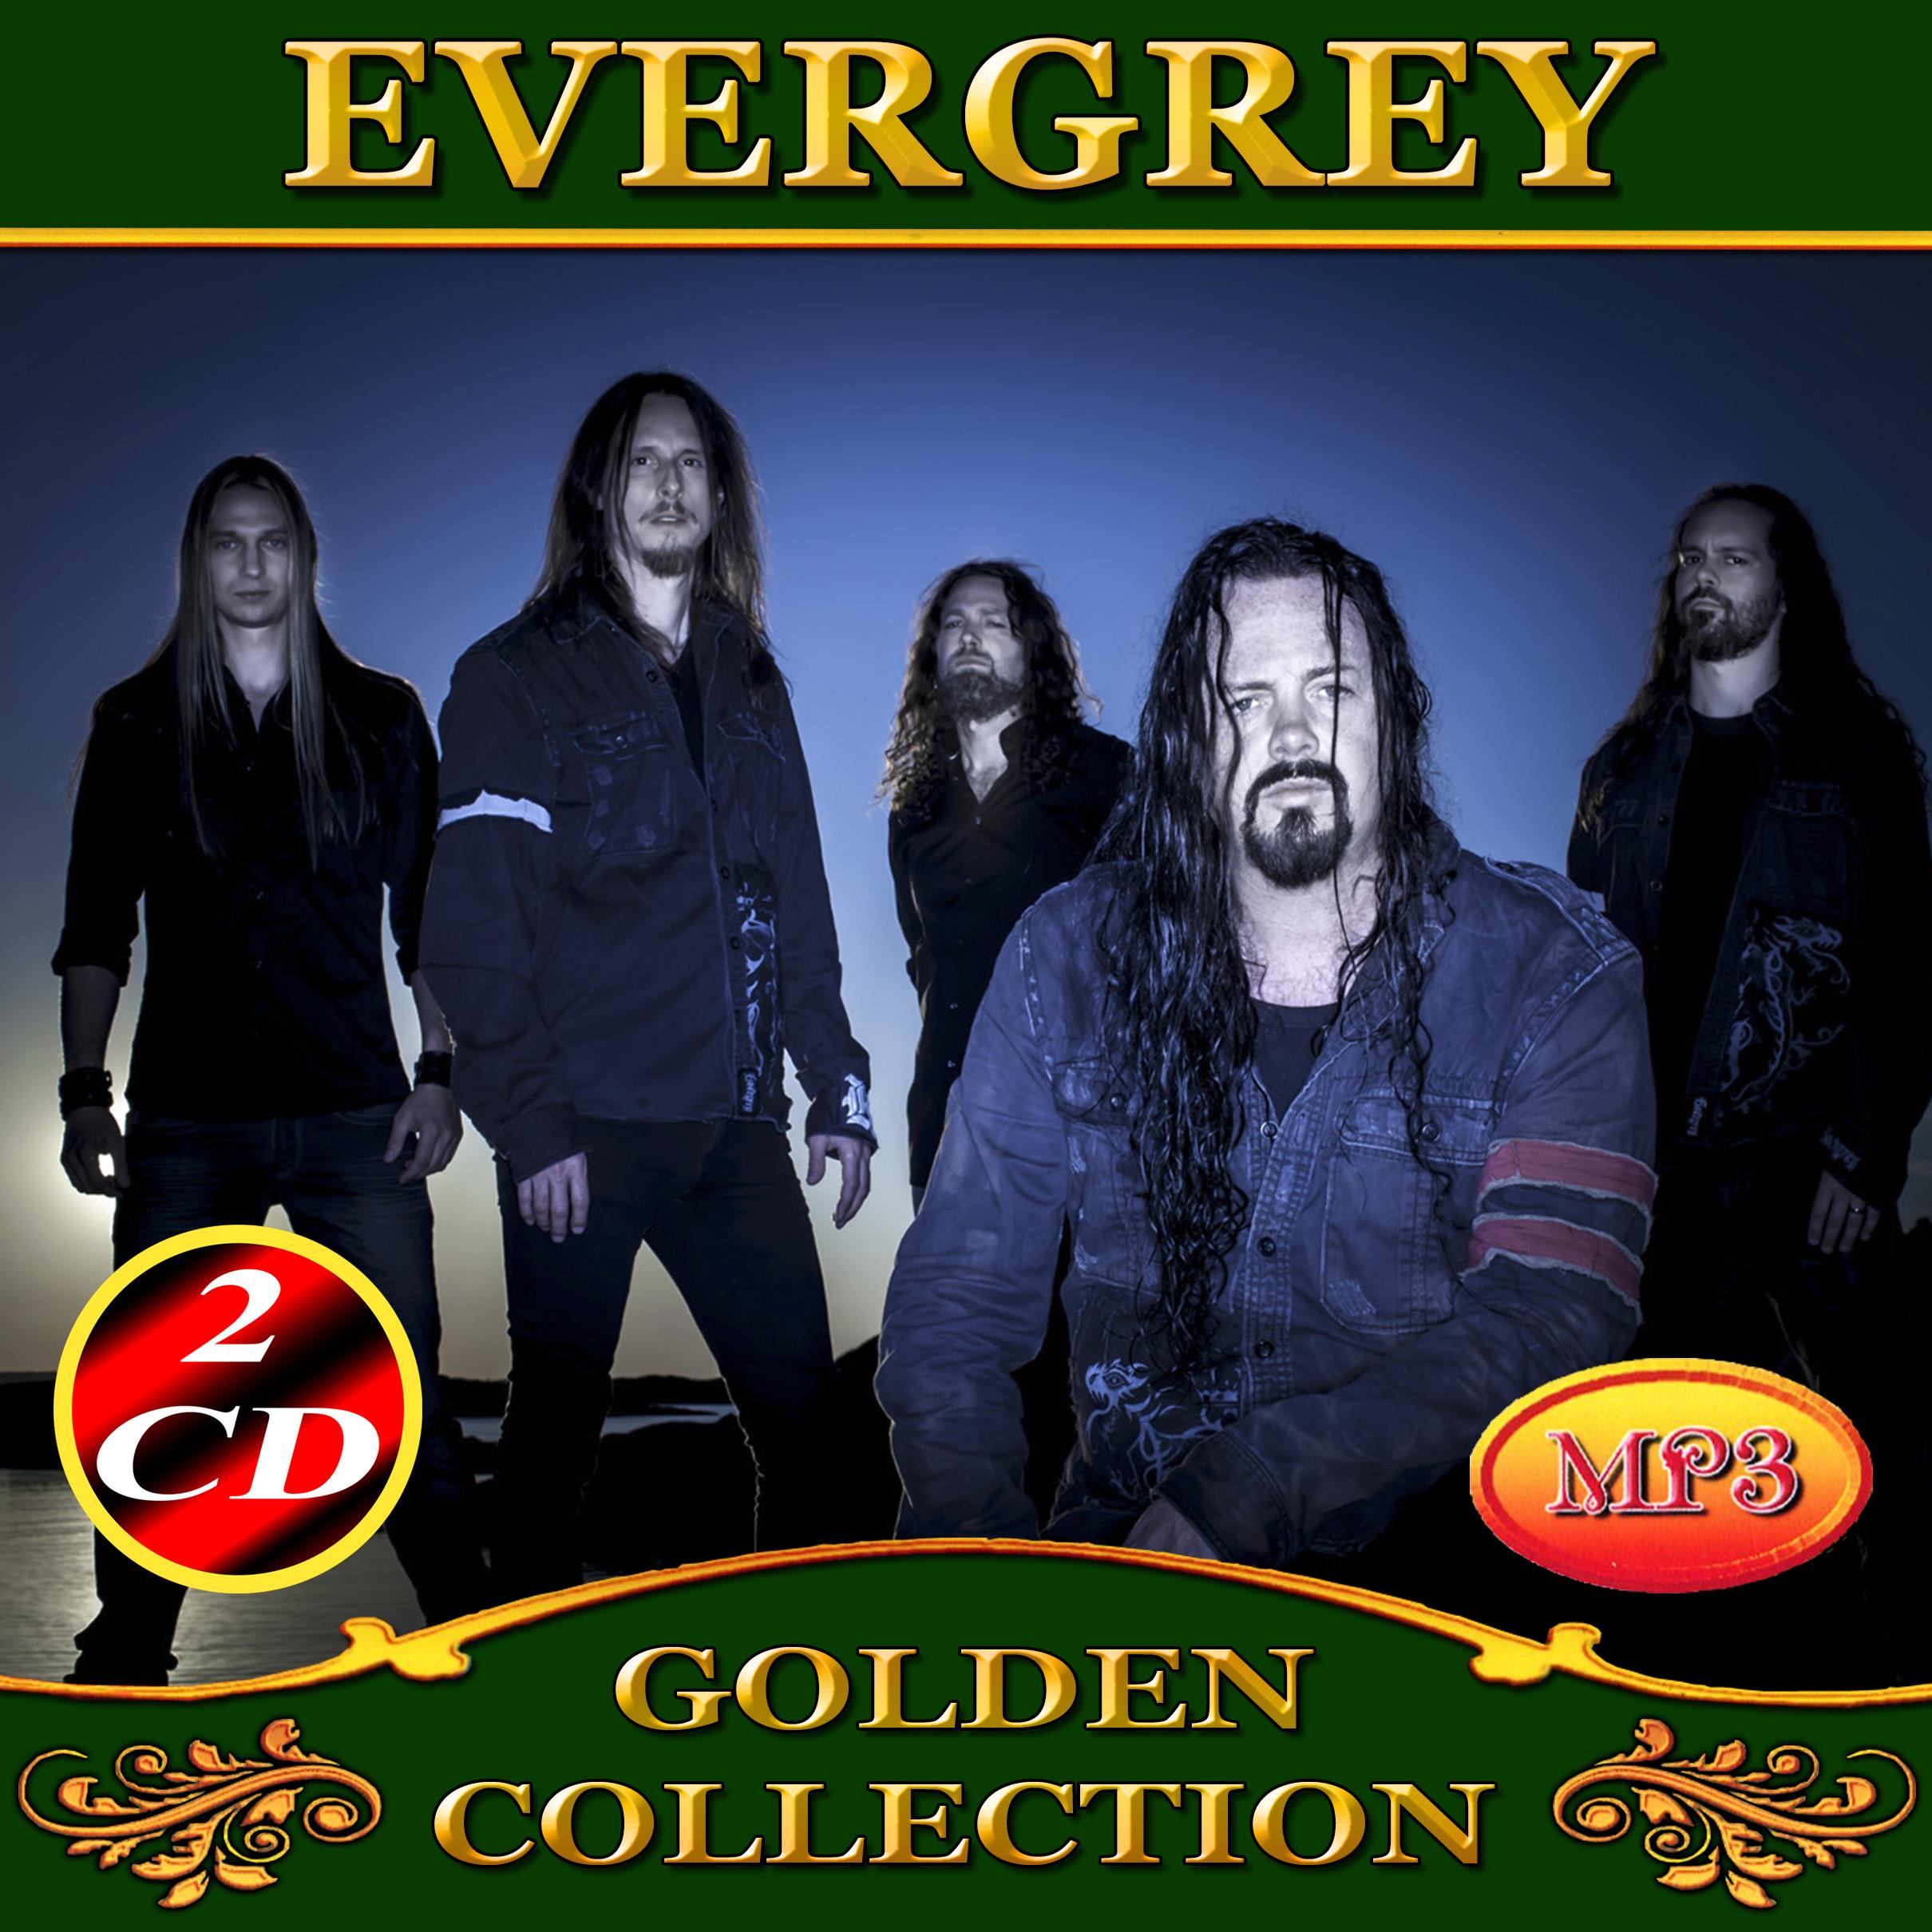 Evergrey 2cd [mp3]